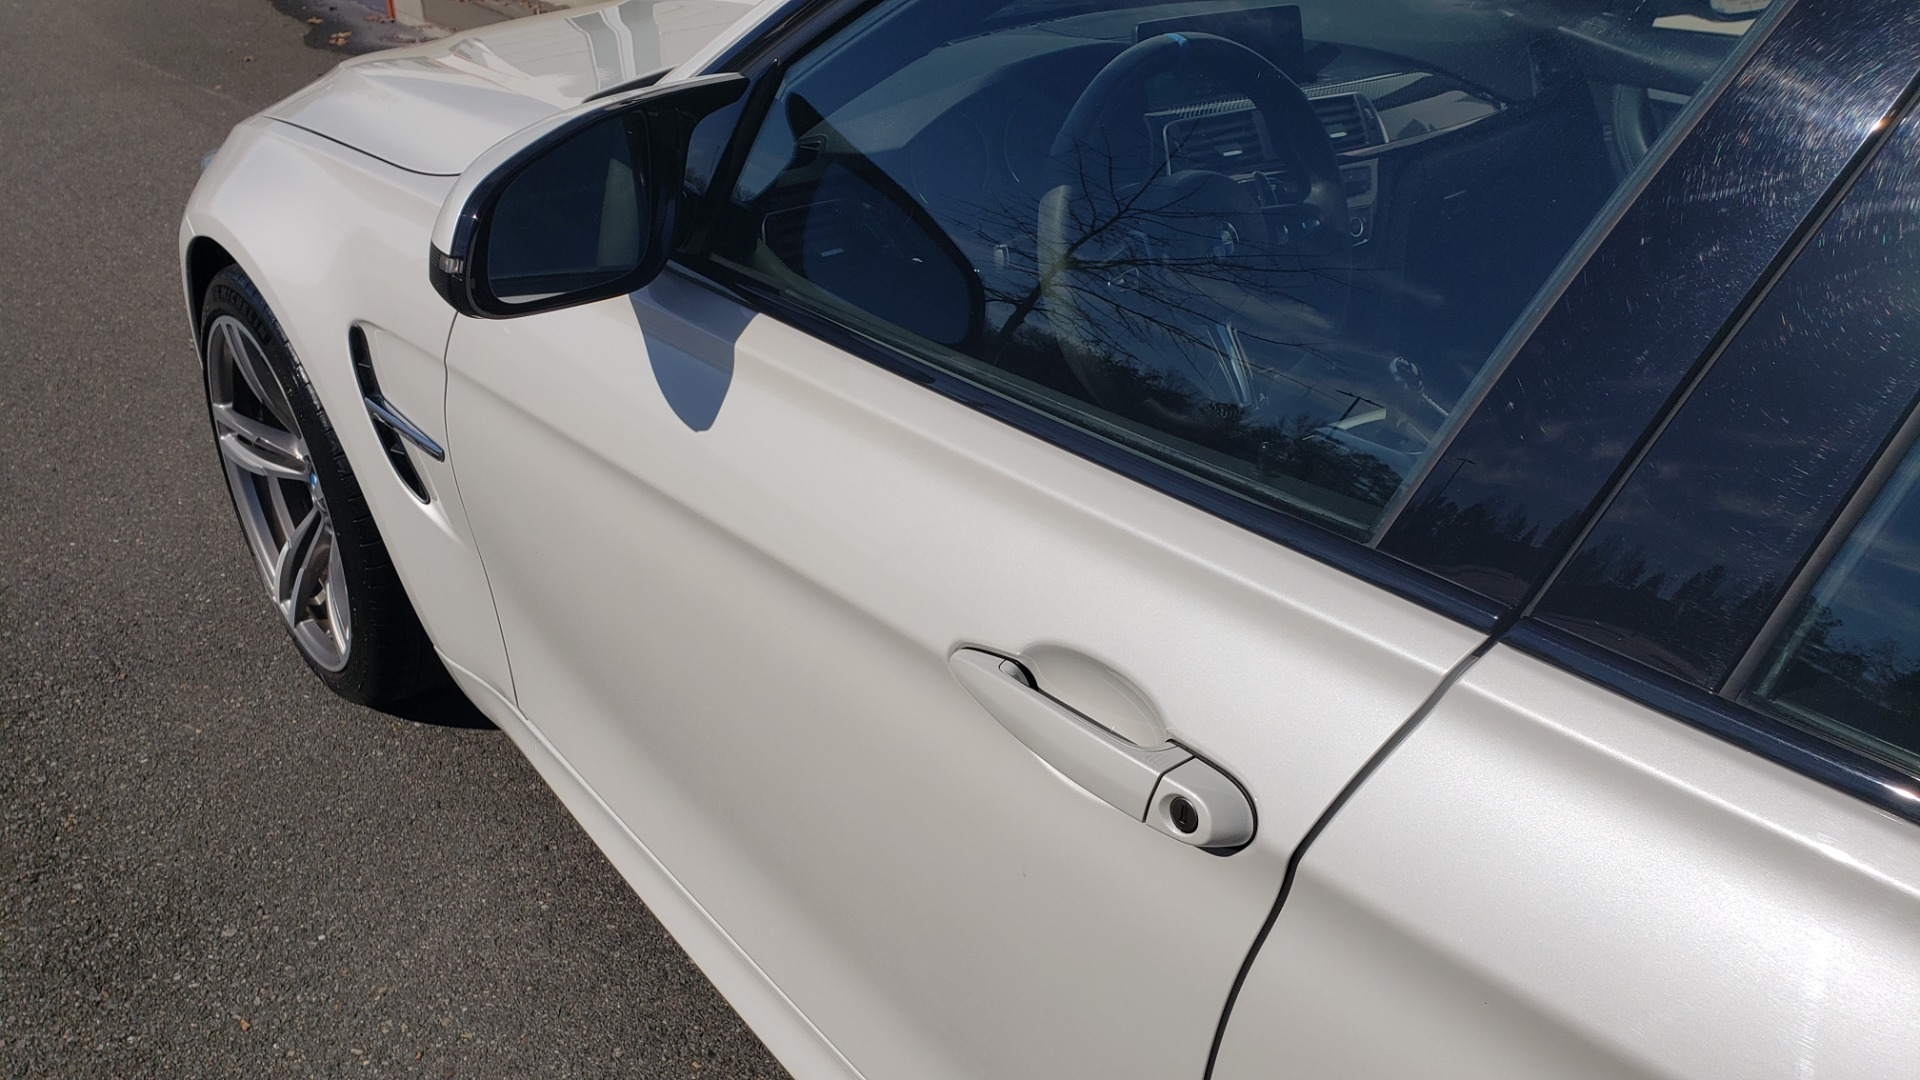 Used 2016 BMW M3 SEDAN / EXECUTIVE PKG / M-SUSPENSION / HARMAN/KARDON SOUND for sale Sold at Formula Imports in Charlotte NC 28227 8